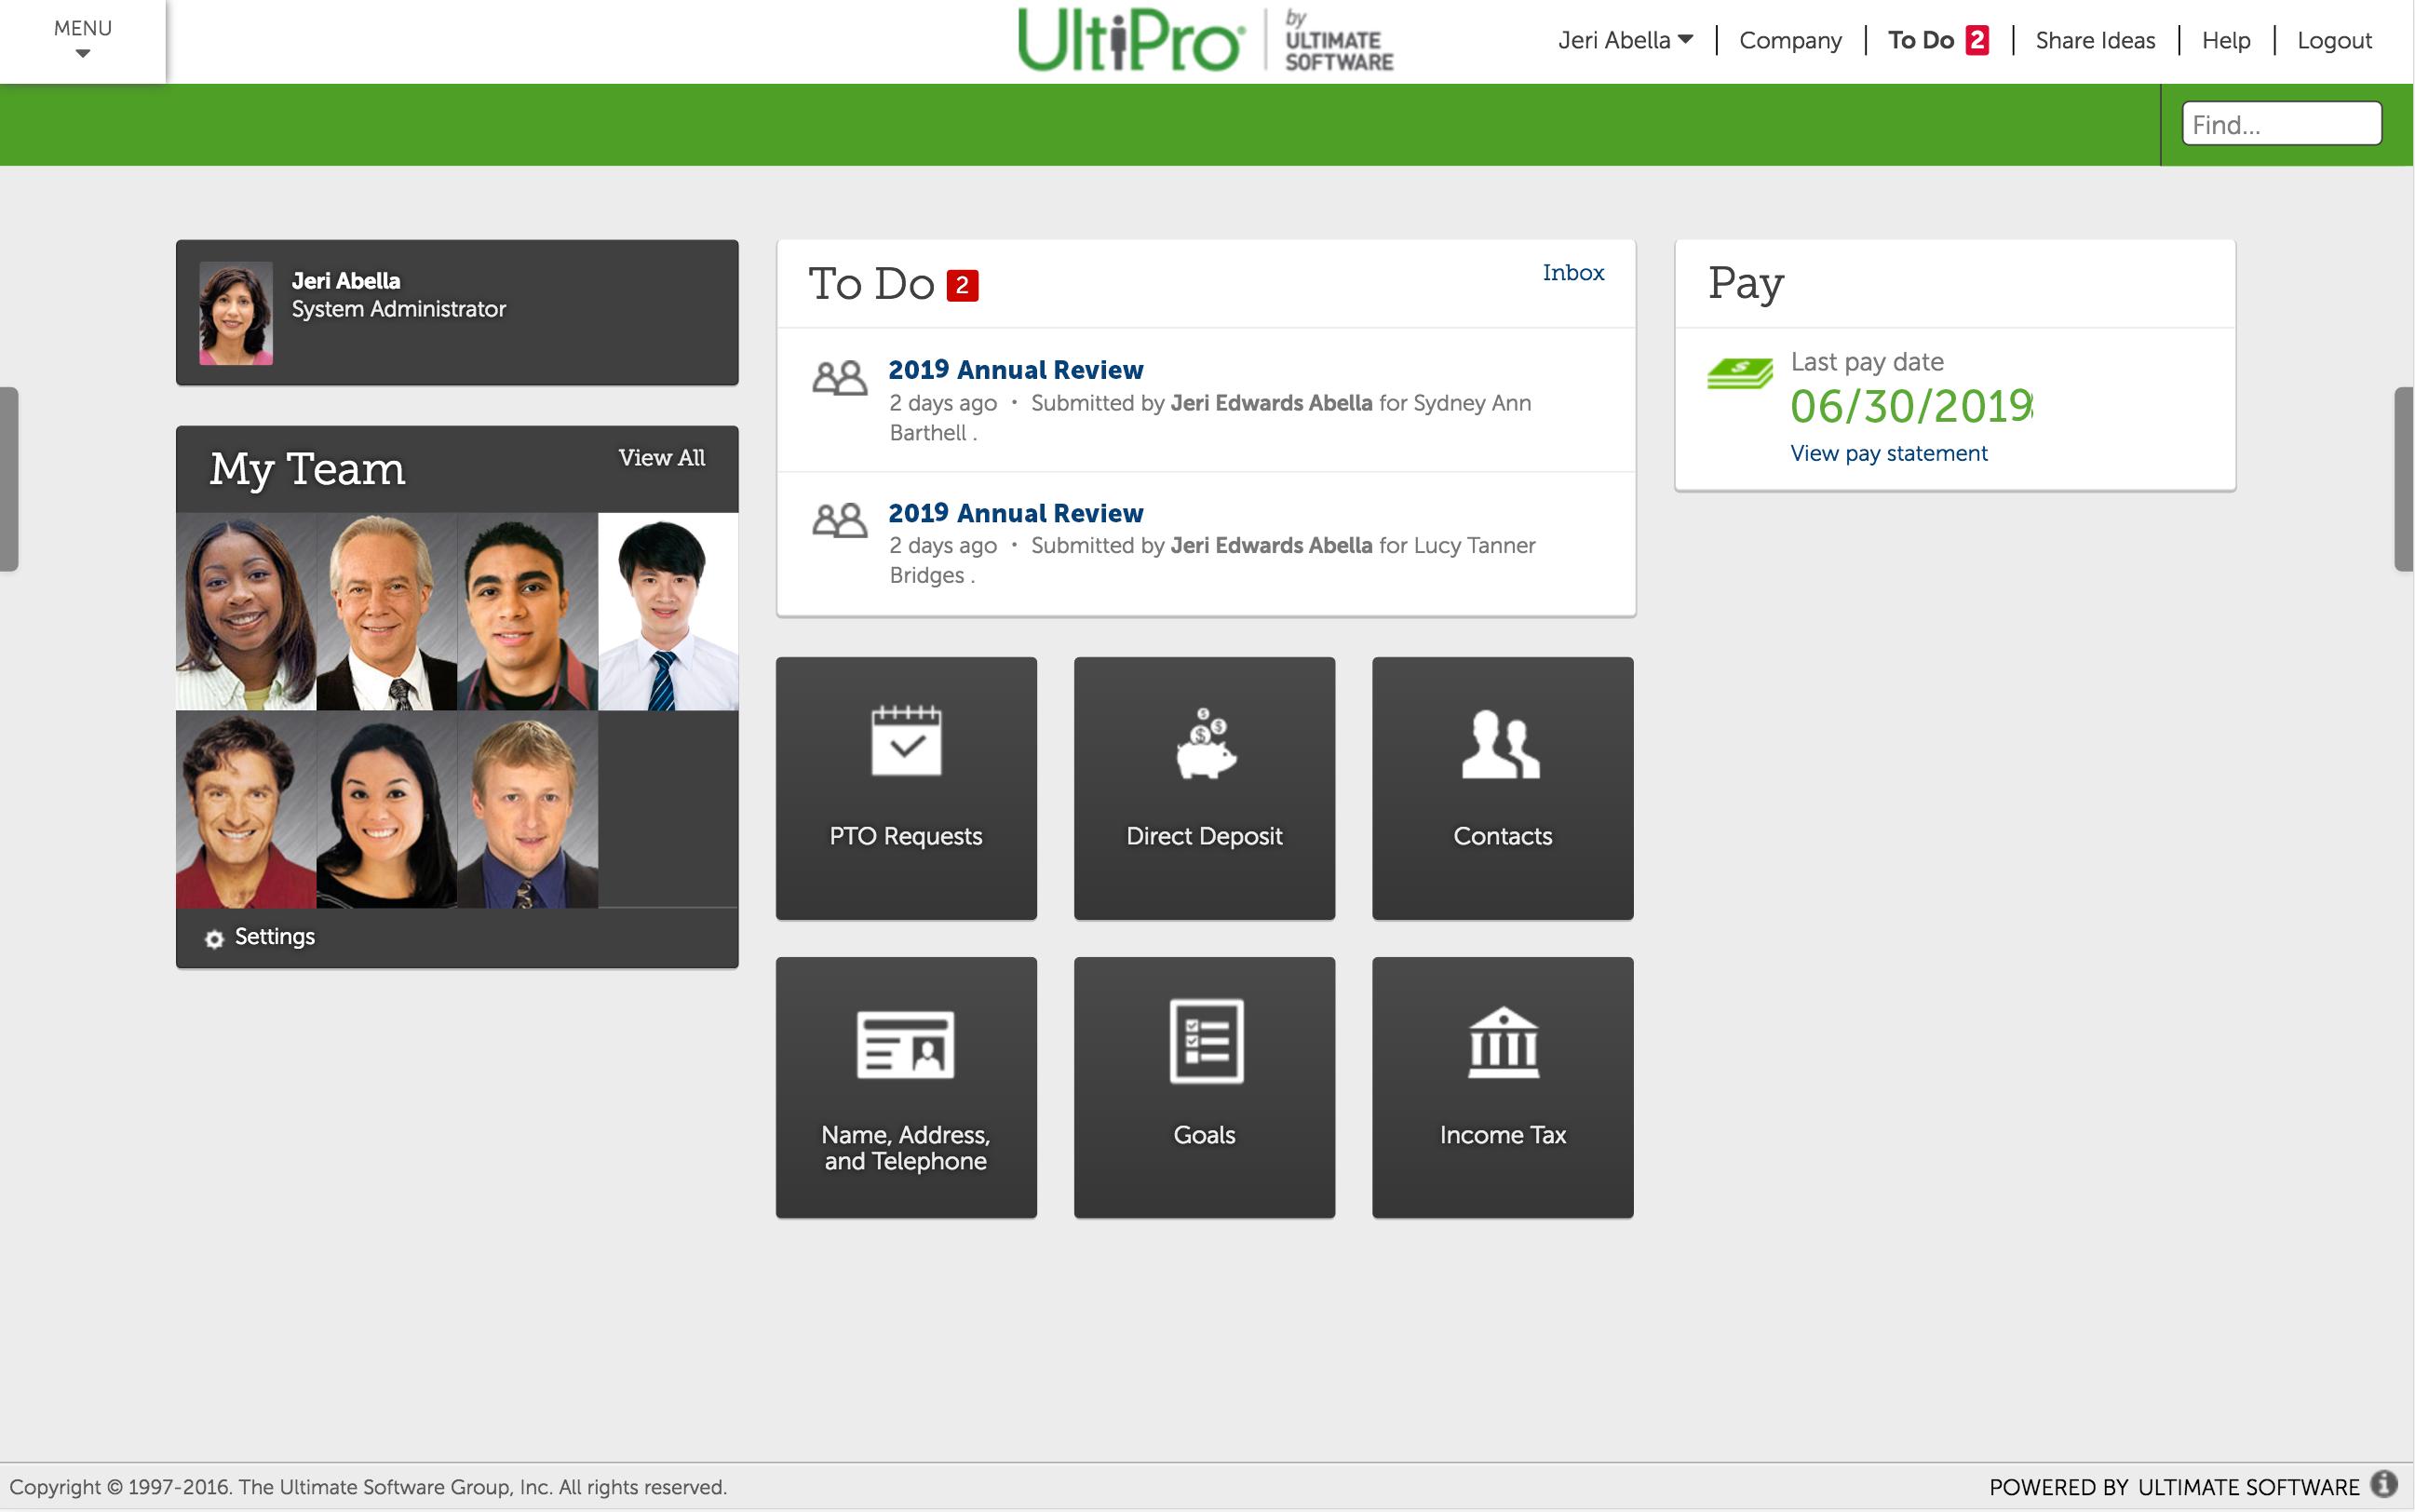 UltiPro Dashboard